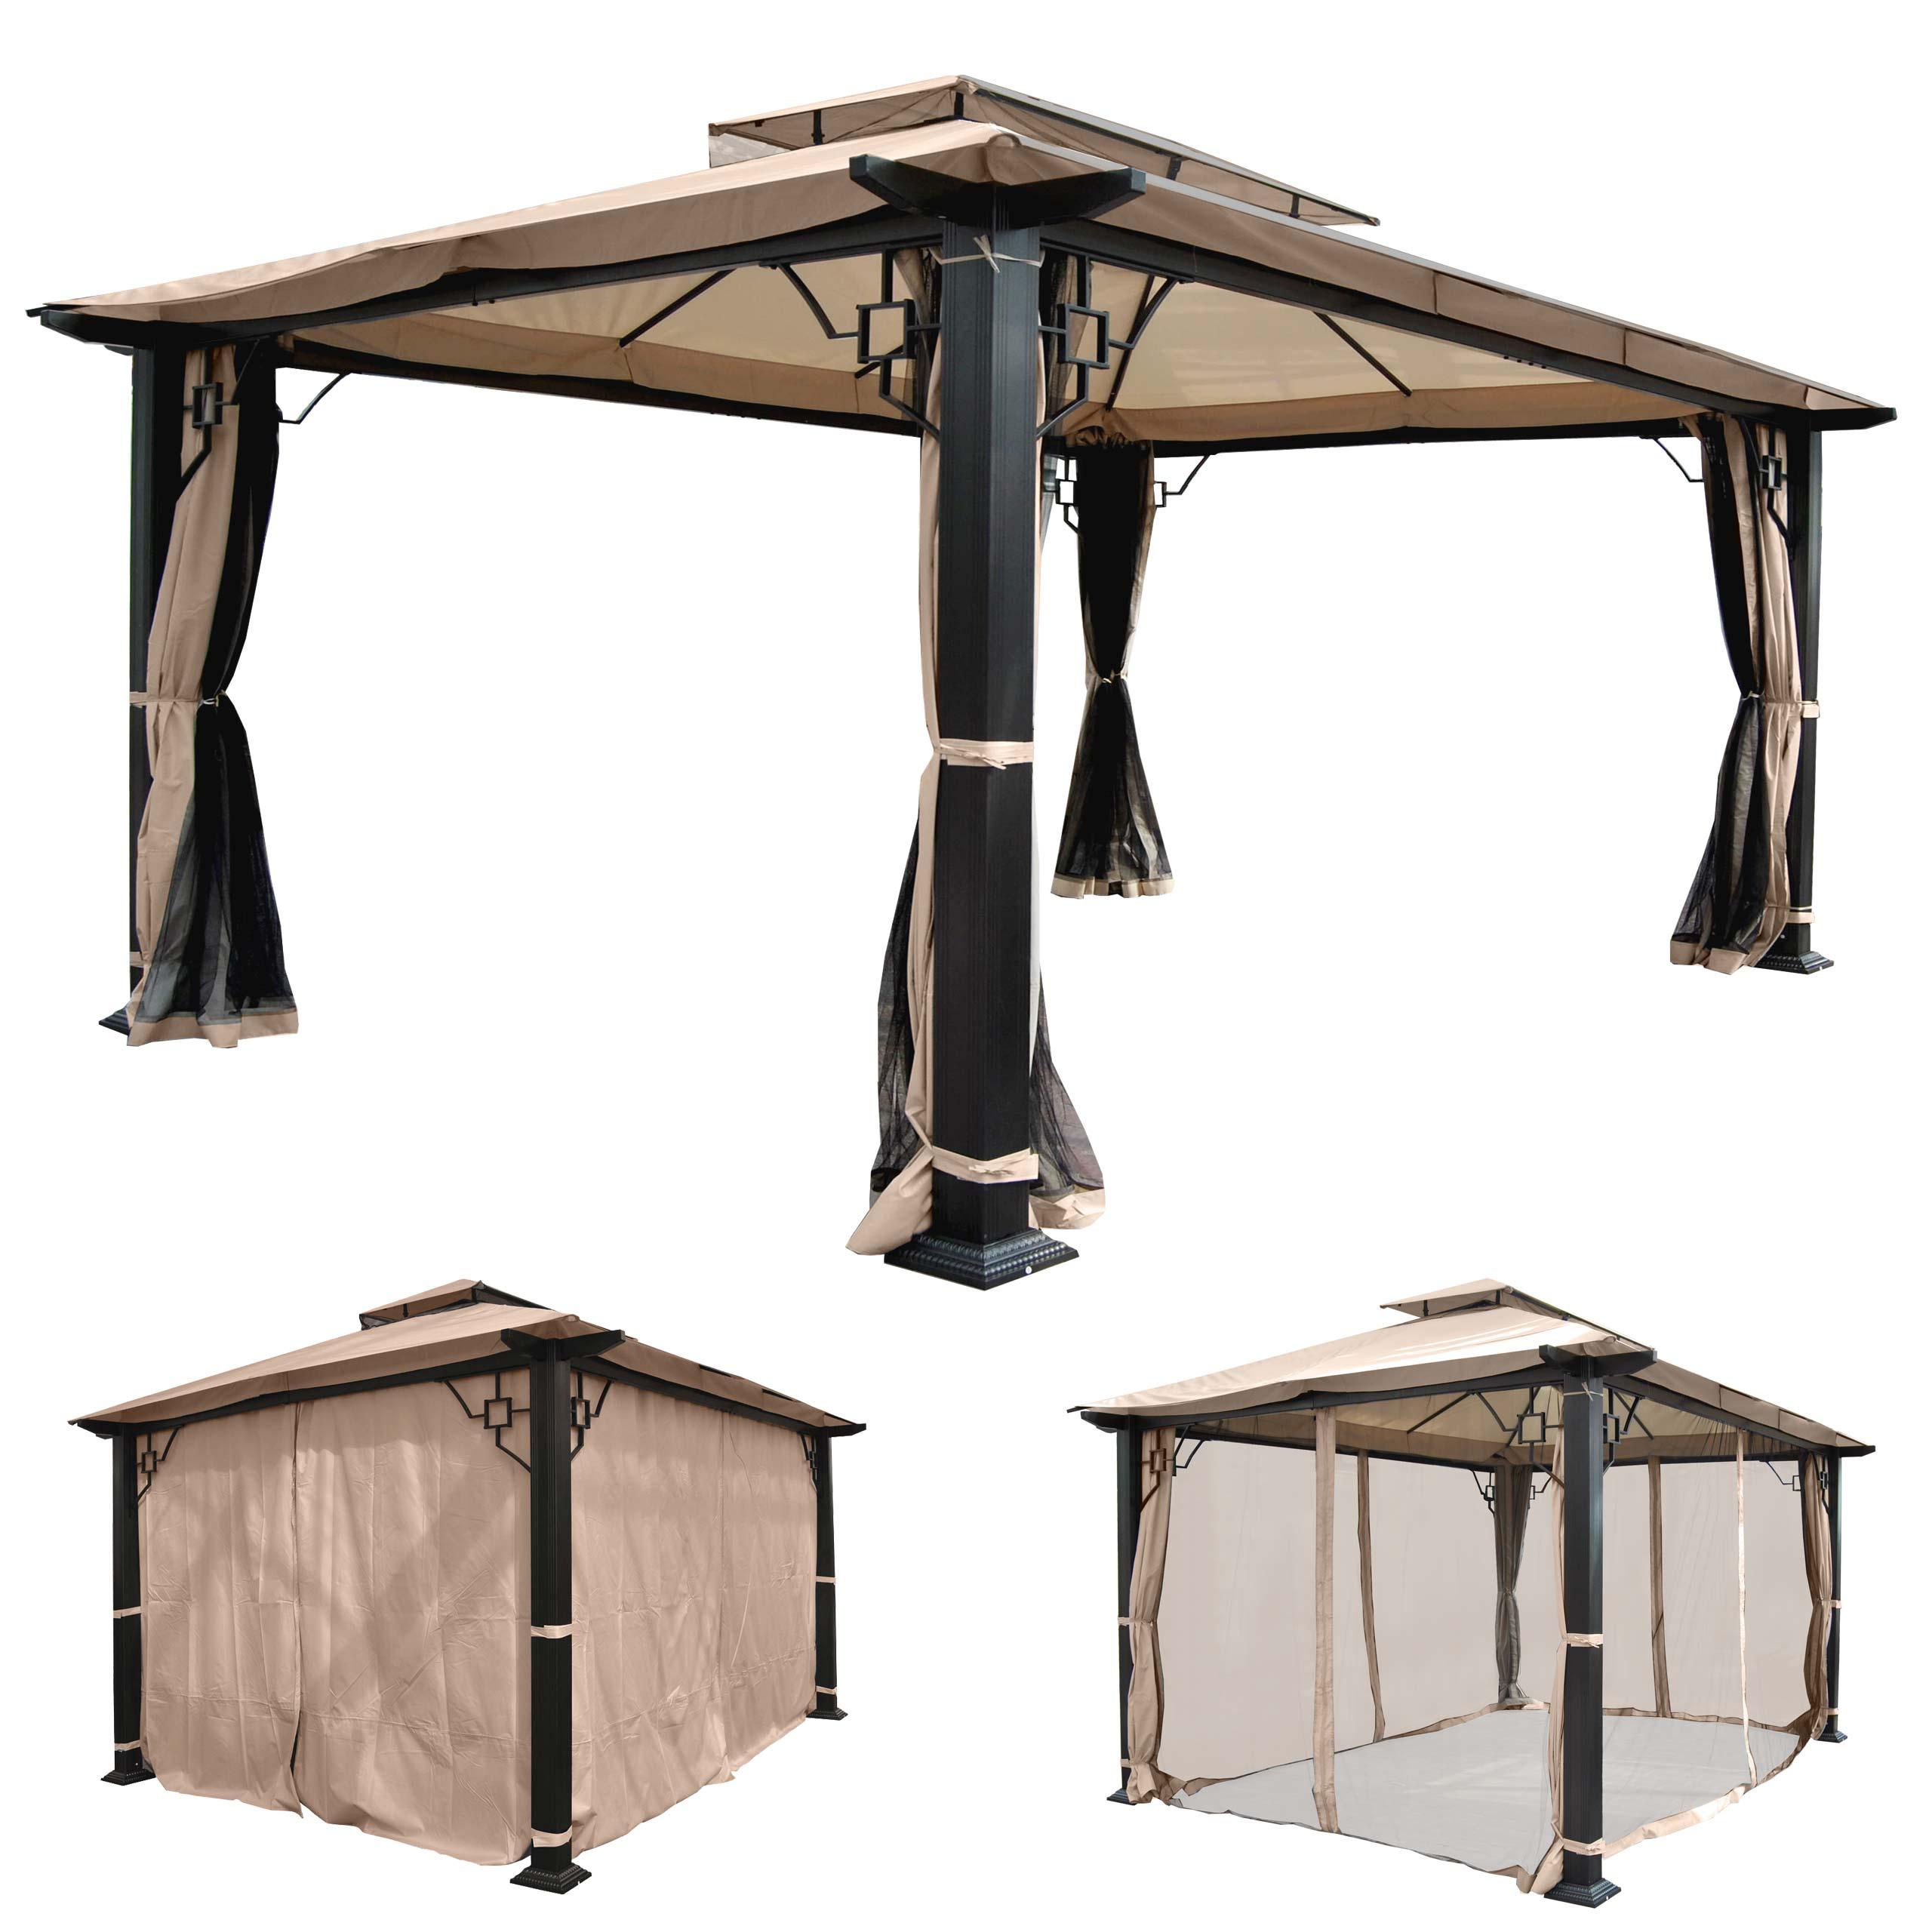 pergola nisa garten pavillon stabiles 12cm luxus alu gestell 4 5x3 5m. Black Bedroom Furniture Sets. Home Design Ideas